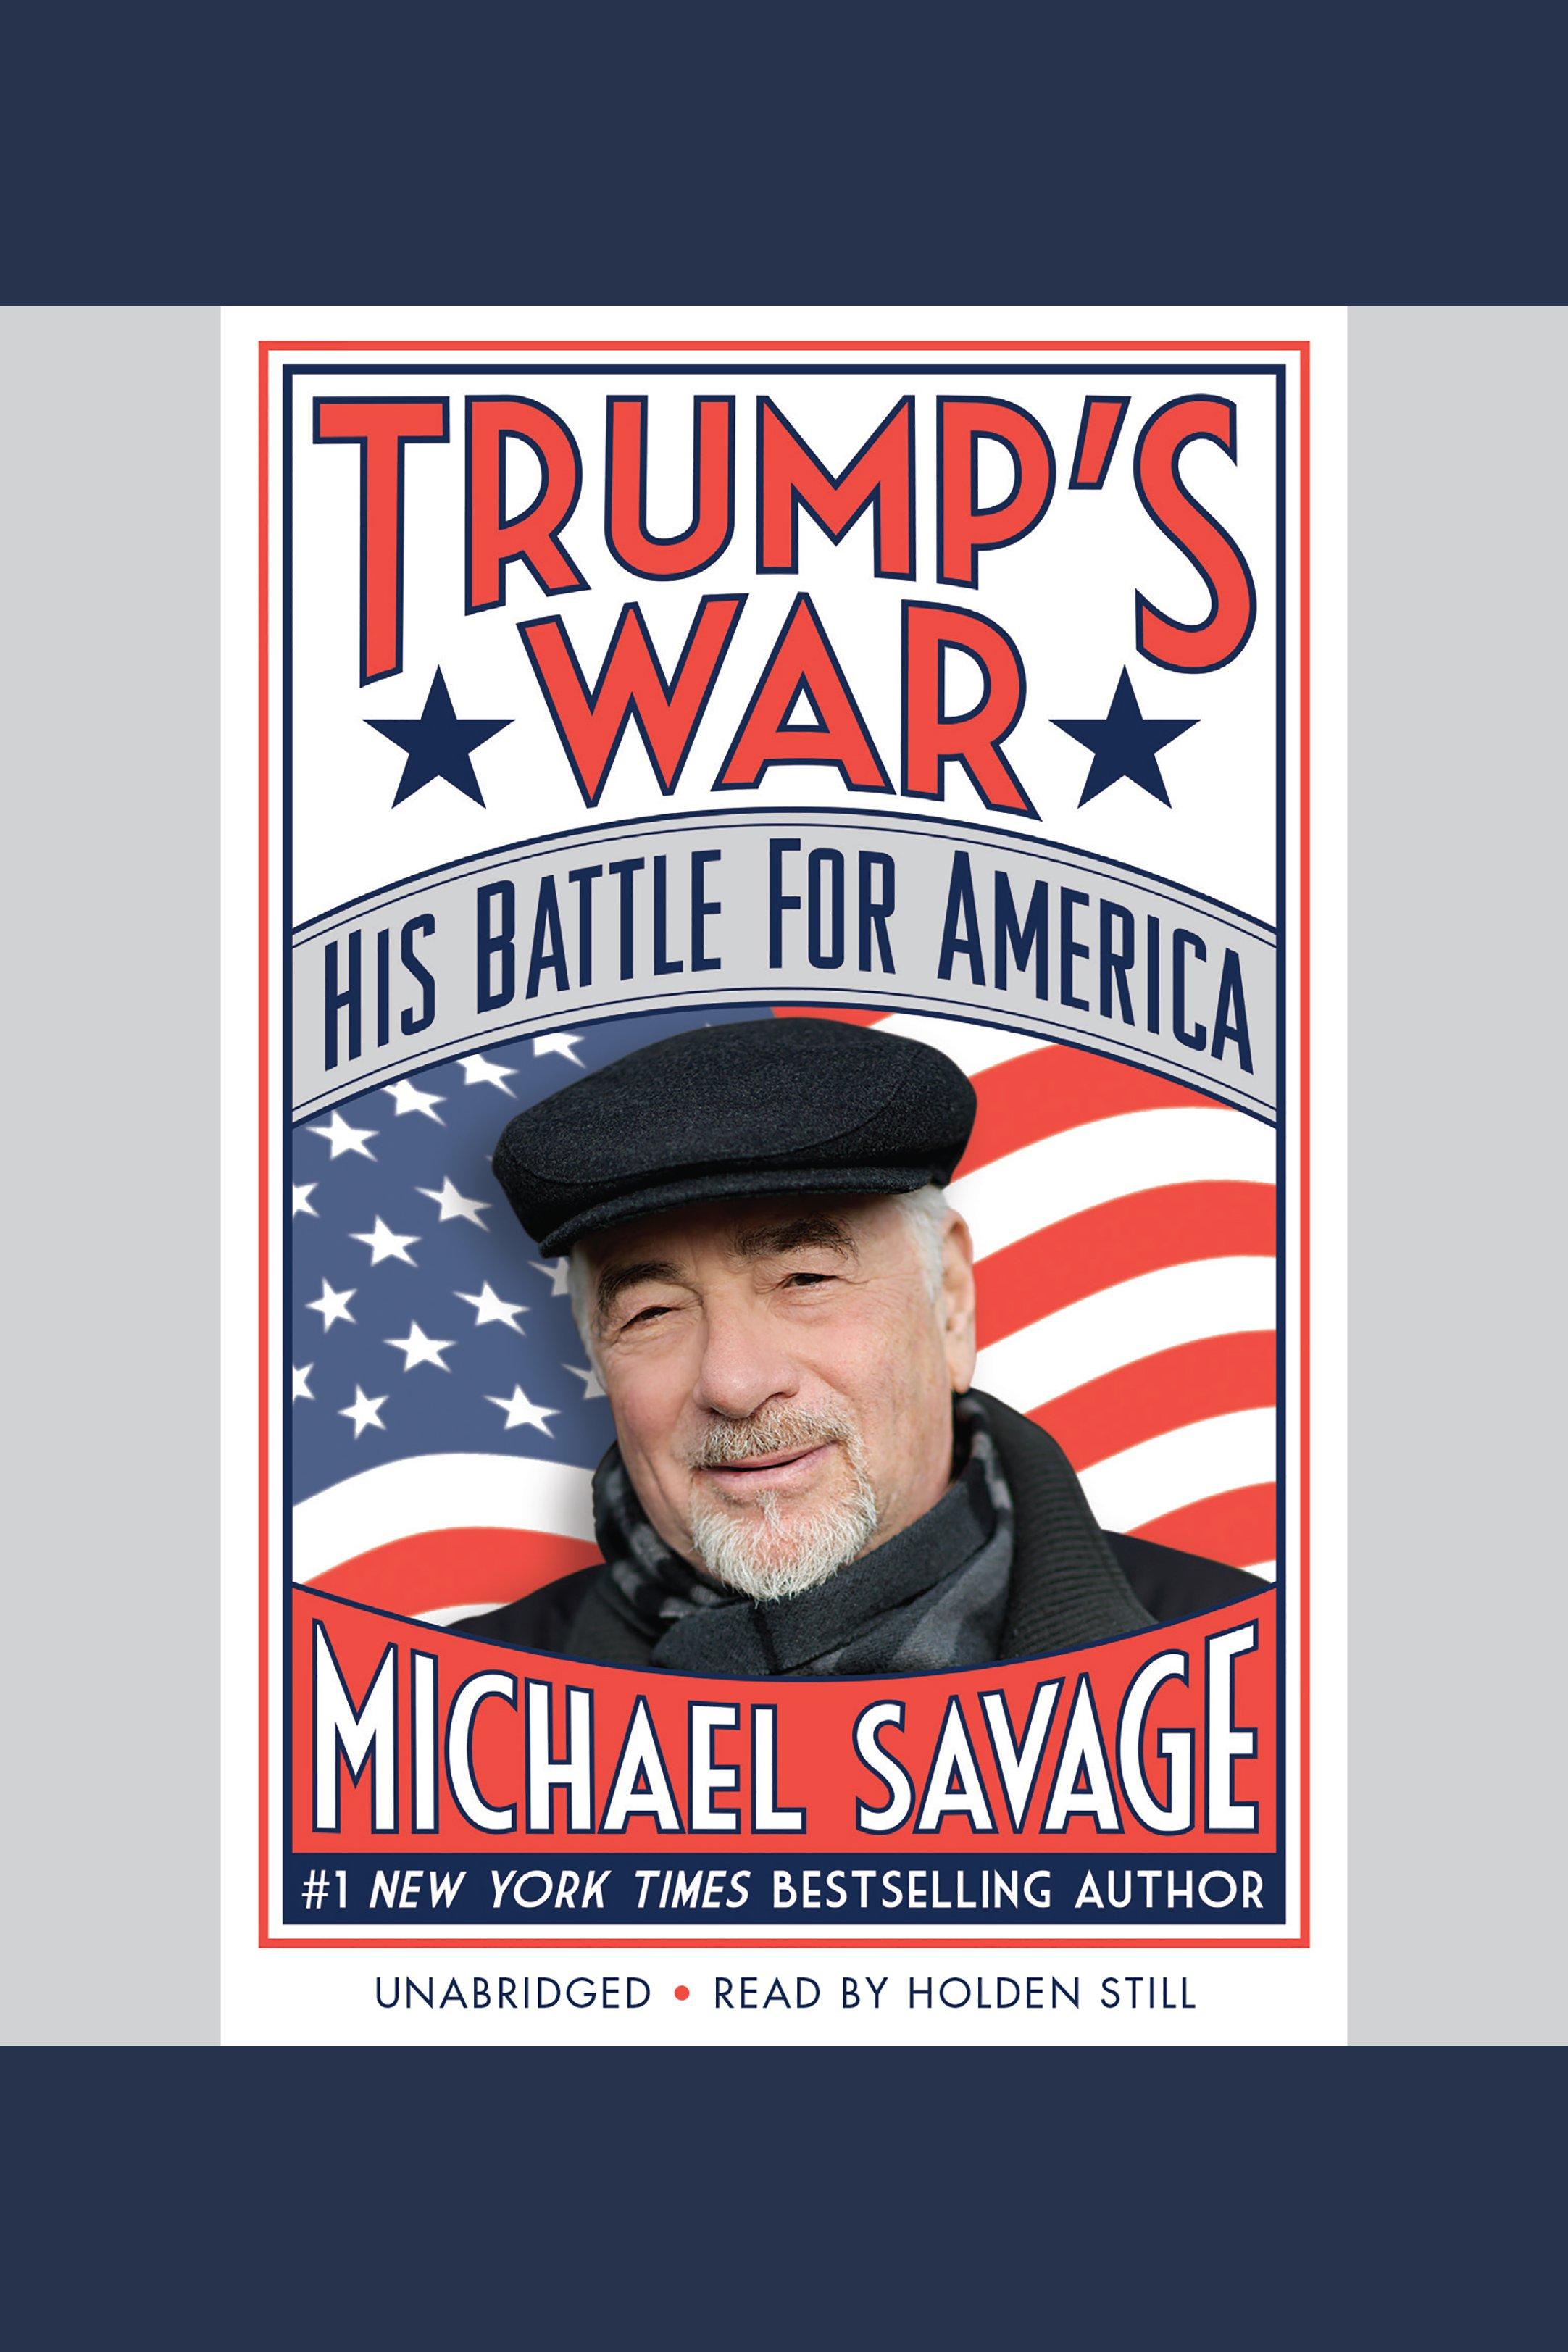 Trump's war [AudioEbook] : his battle for America